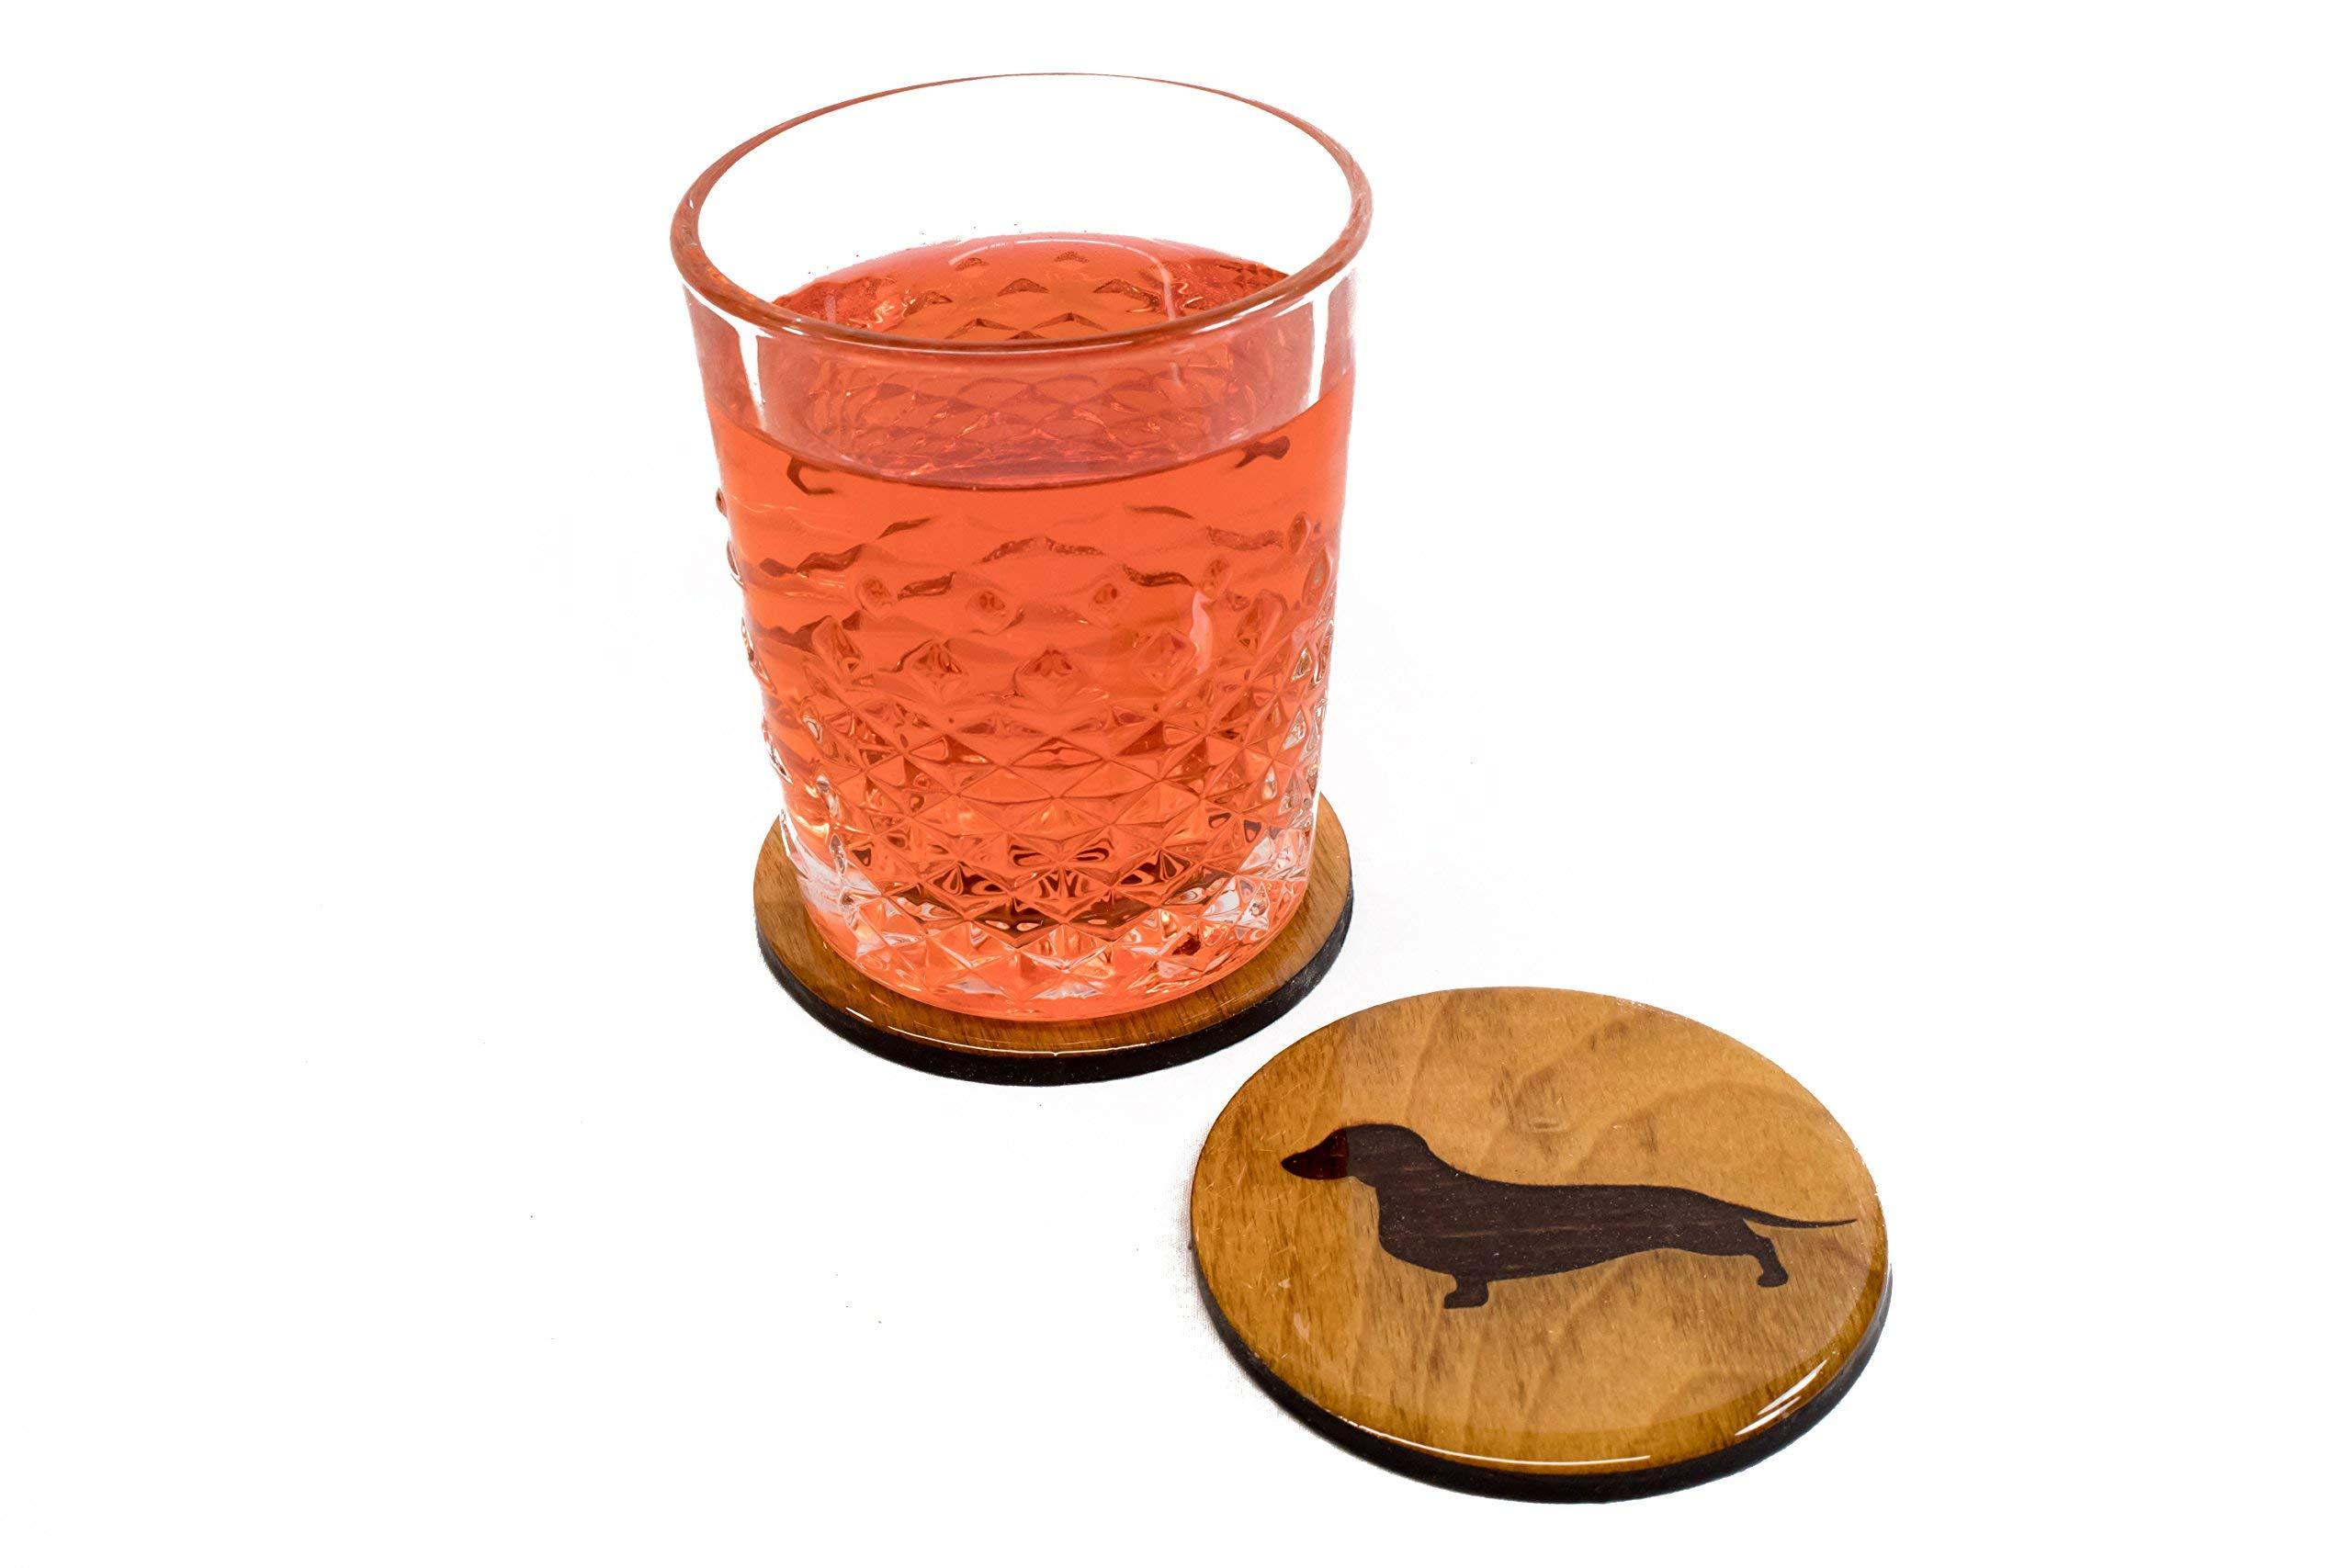 Premium Daschund Coasters - 4 Fun Handmade Engraved 3.5'' Round Wooden Natural Home Animal